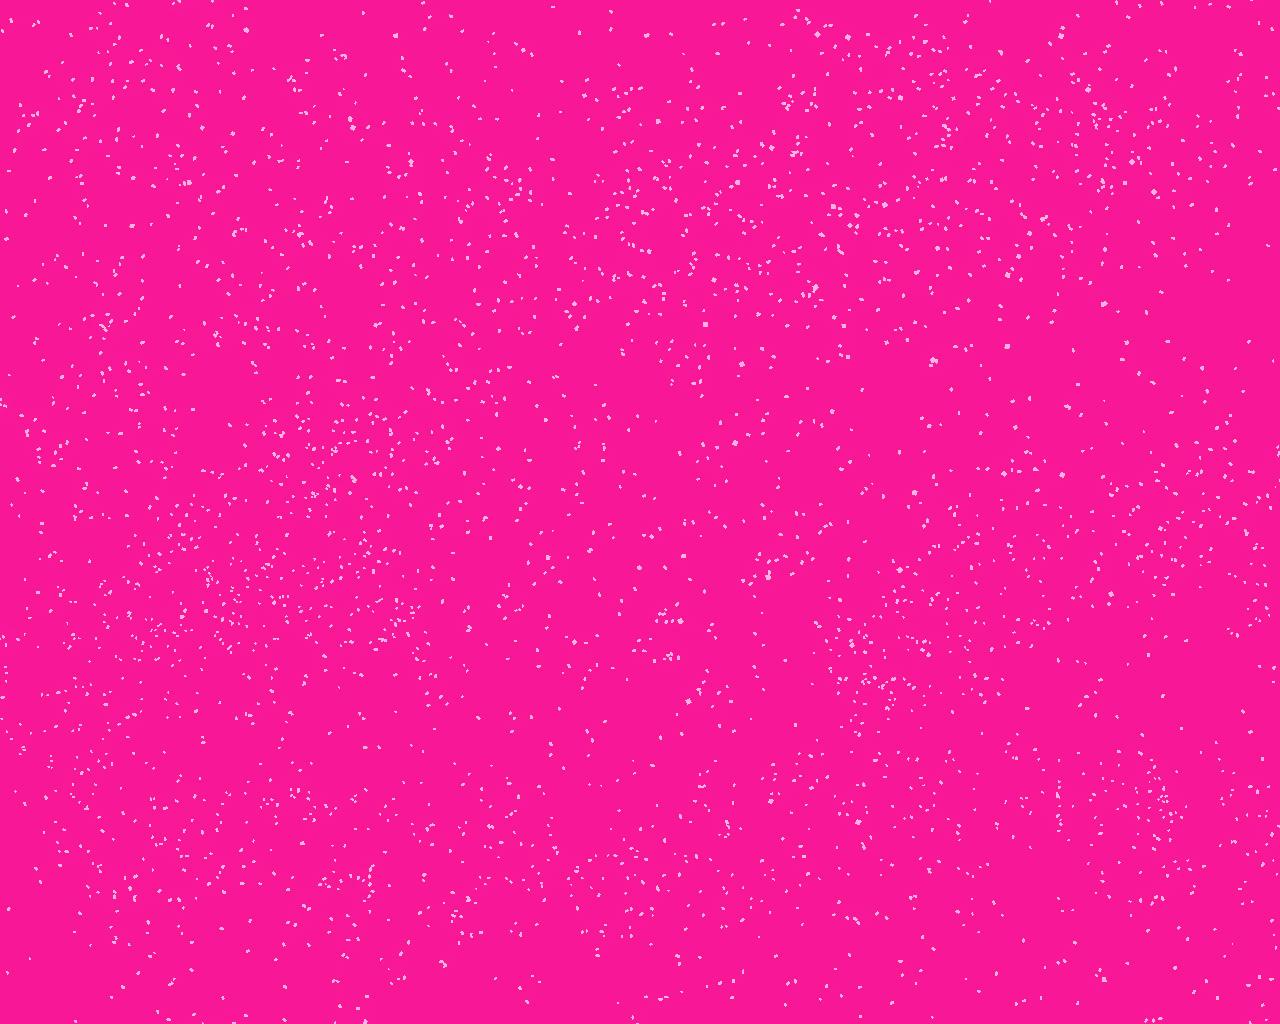 pink sparkle wallpaper wallpapersafari